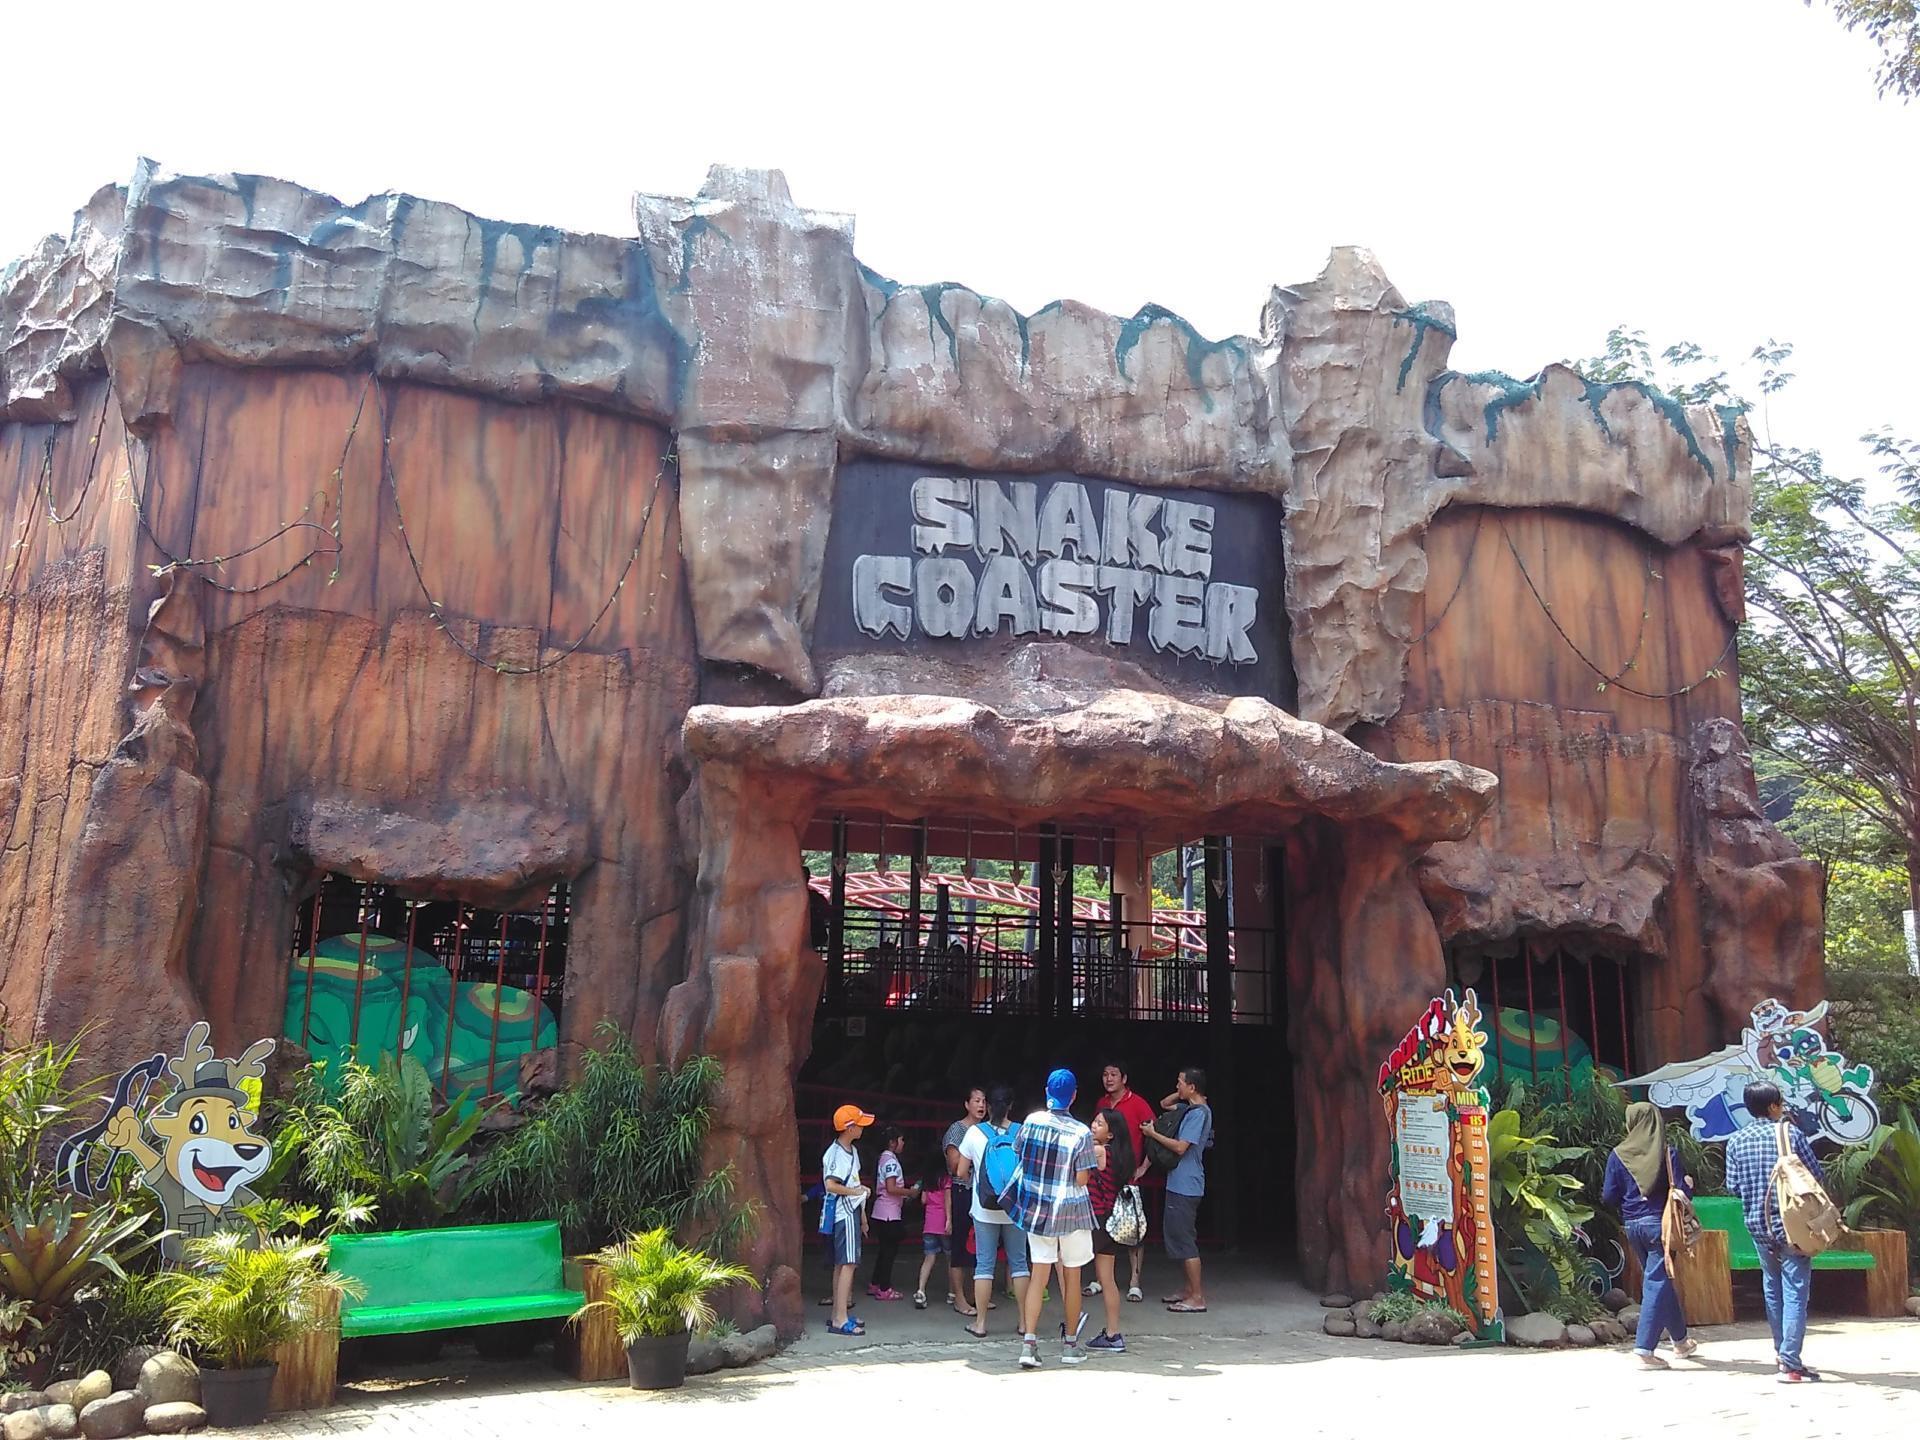 Jungleland Sentul Tiket 8 Zona dan 8+ Wahana - Rubrik Wisata